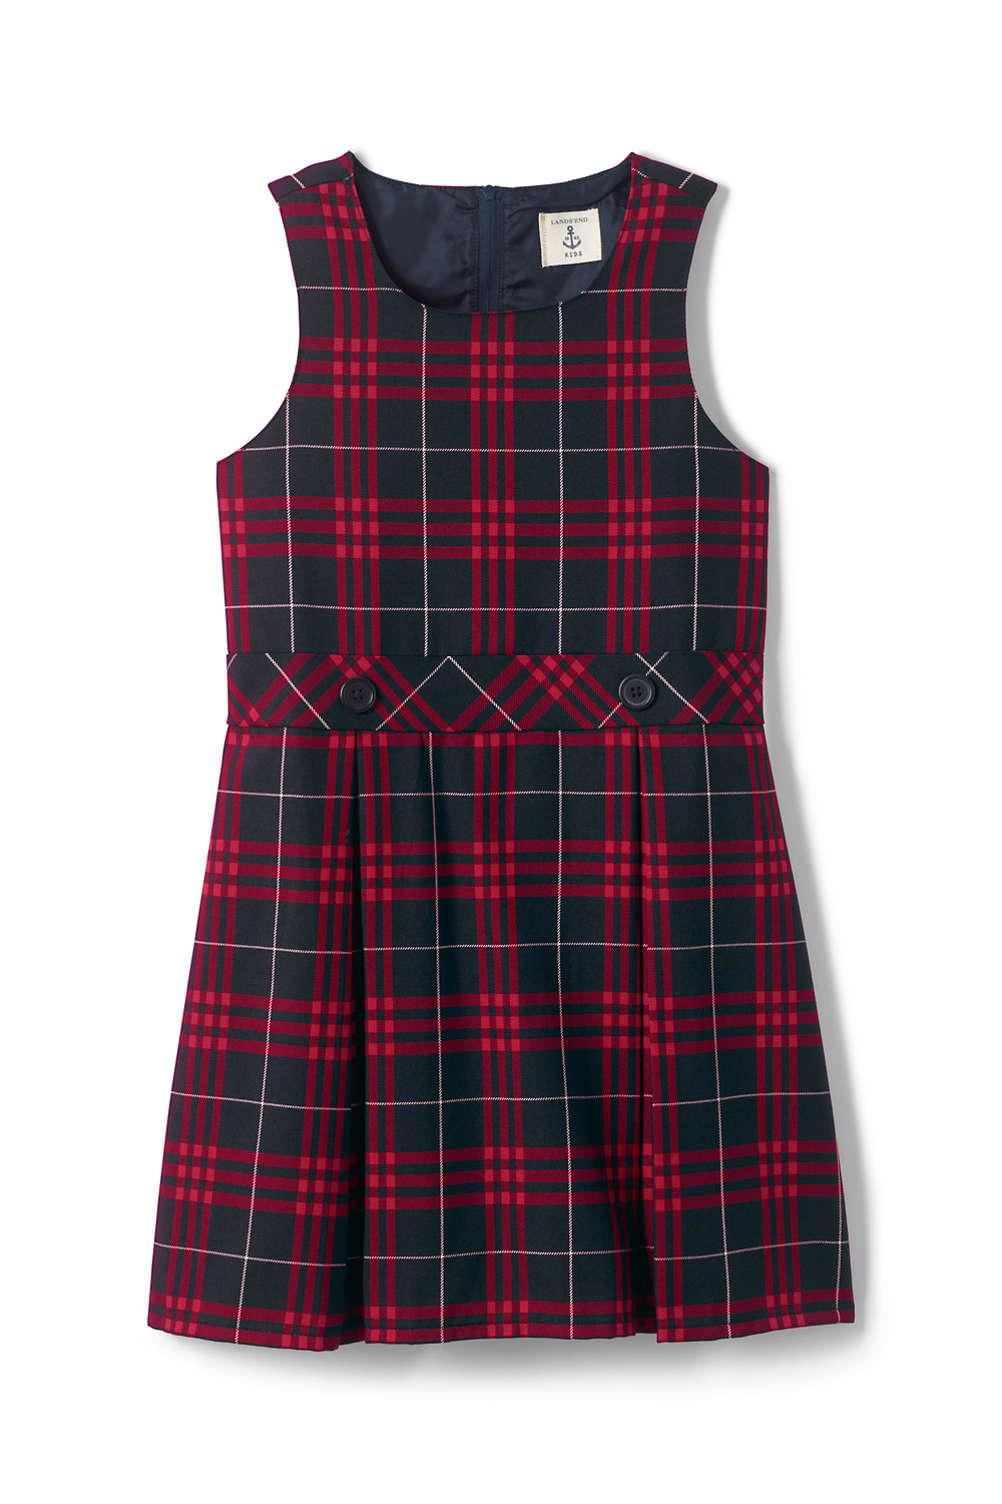 f5da11532 School Uniform Girls Plaid Jumper from Lands  End